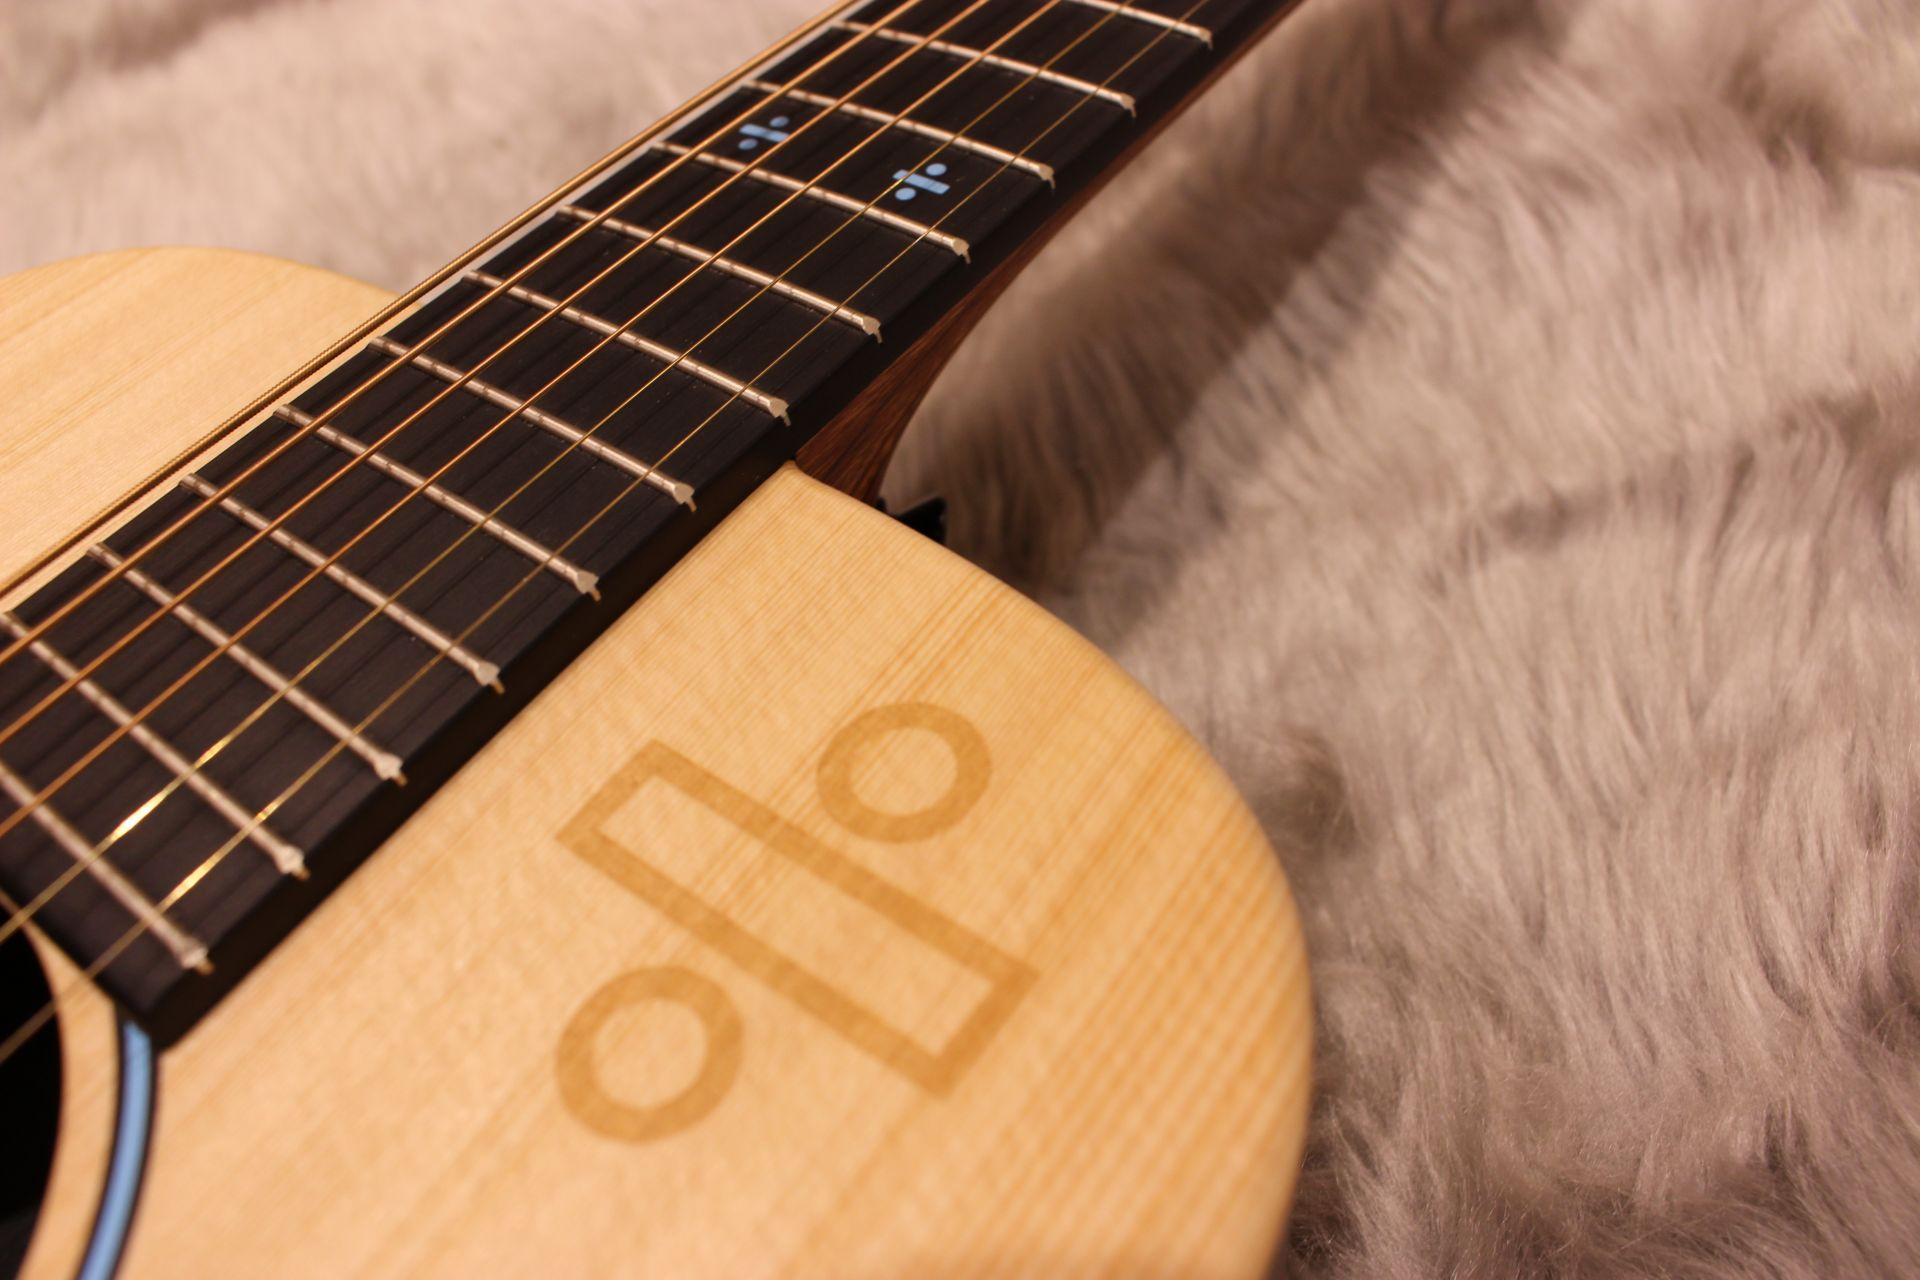 LX Ed Sheeran 3の全体画像(縦)